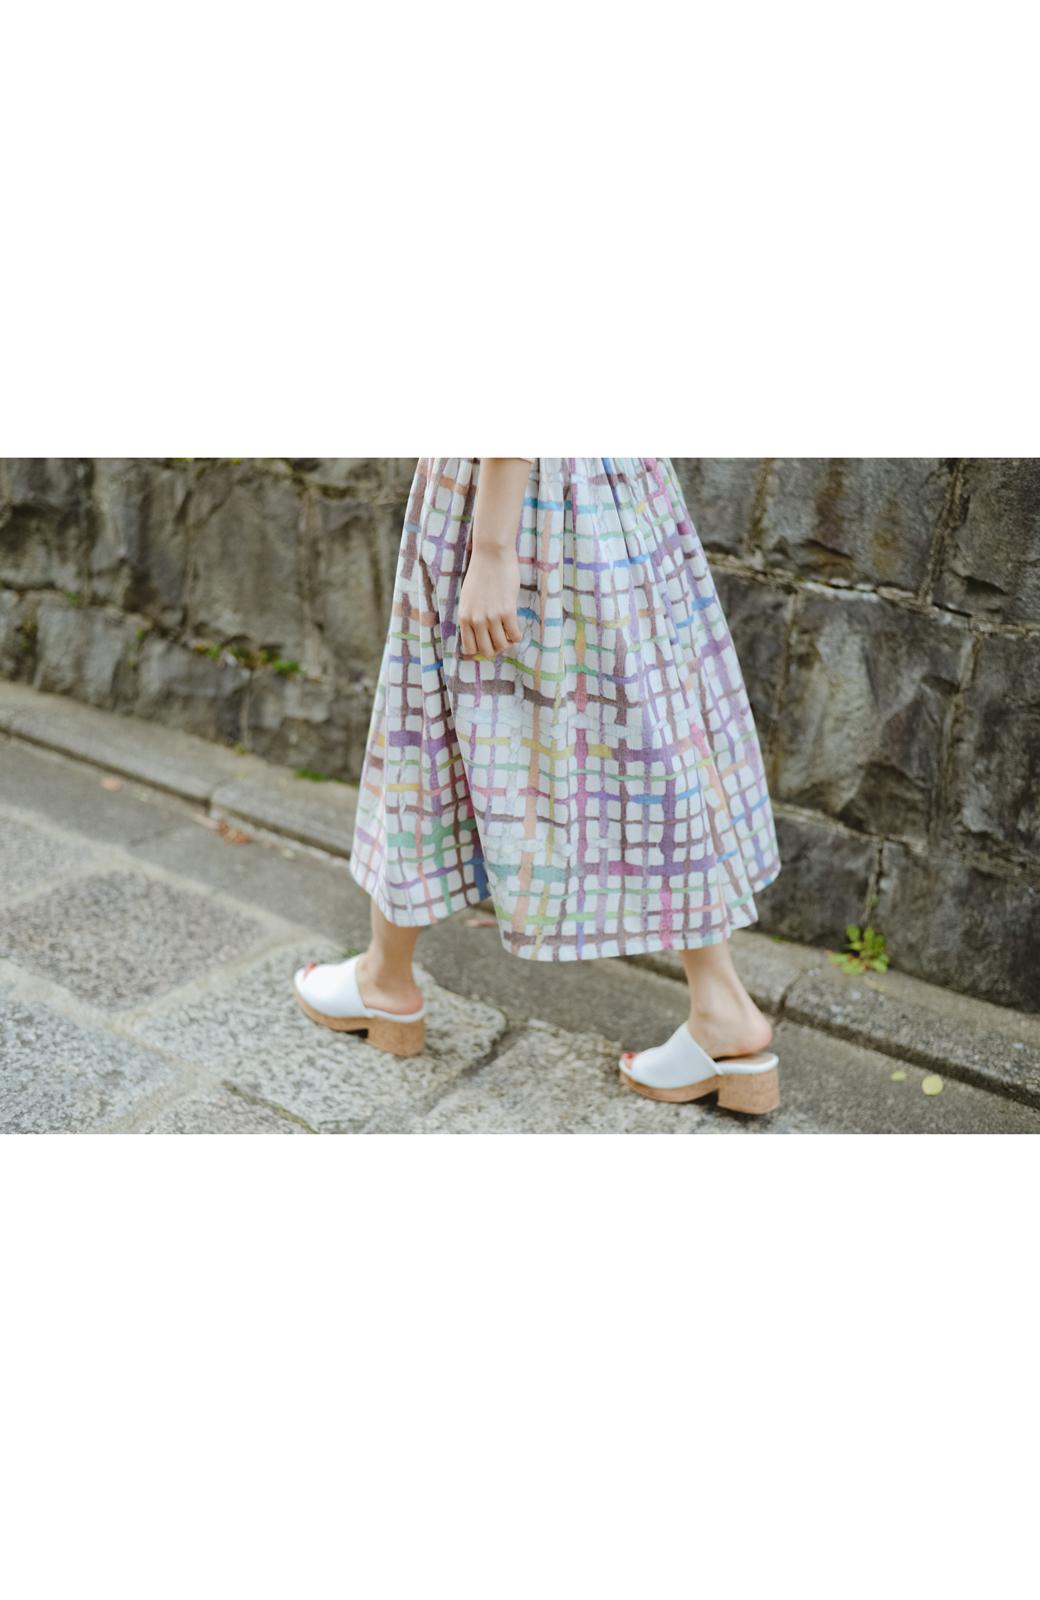 haco! 京都の浴衣屋さんと作った浴衣生地のスカート <ベージュ系その他>の商品写真9